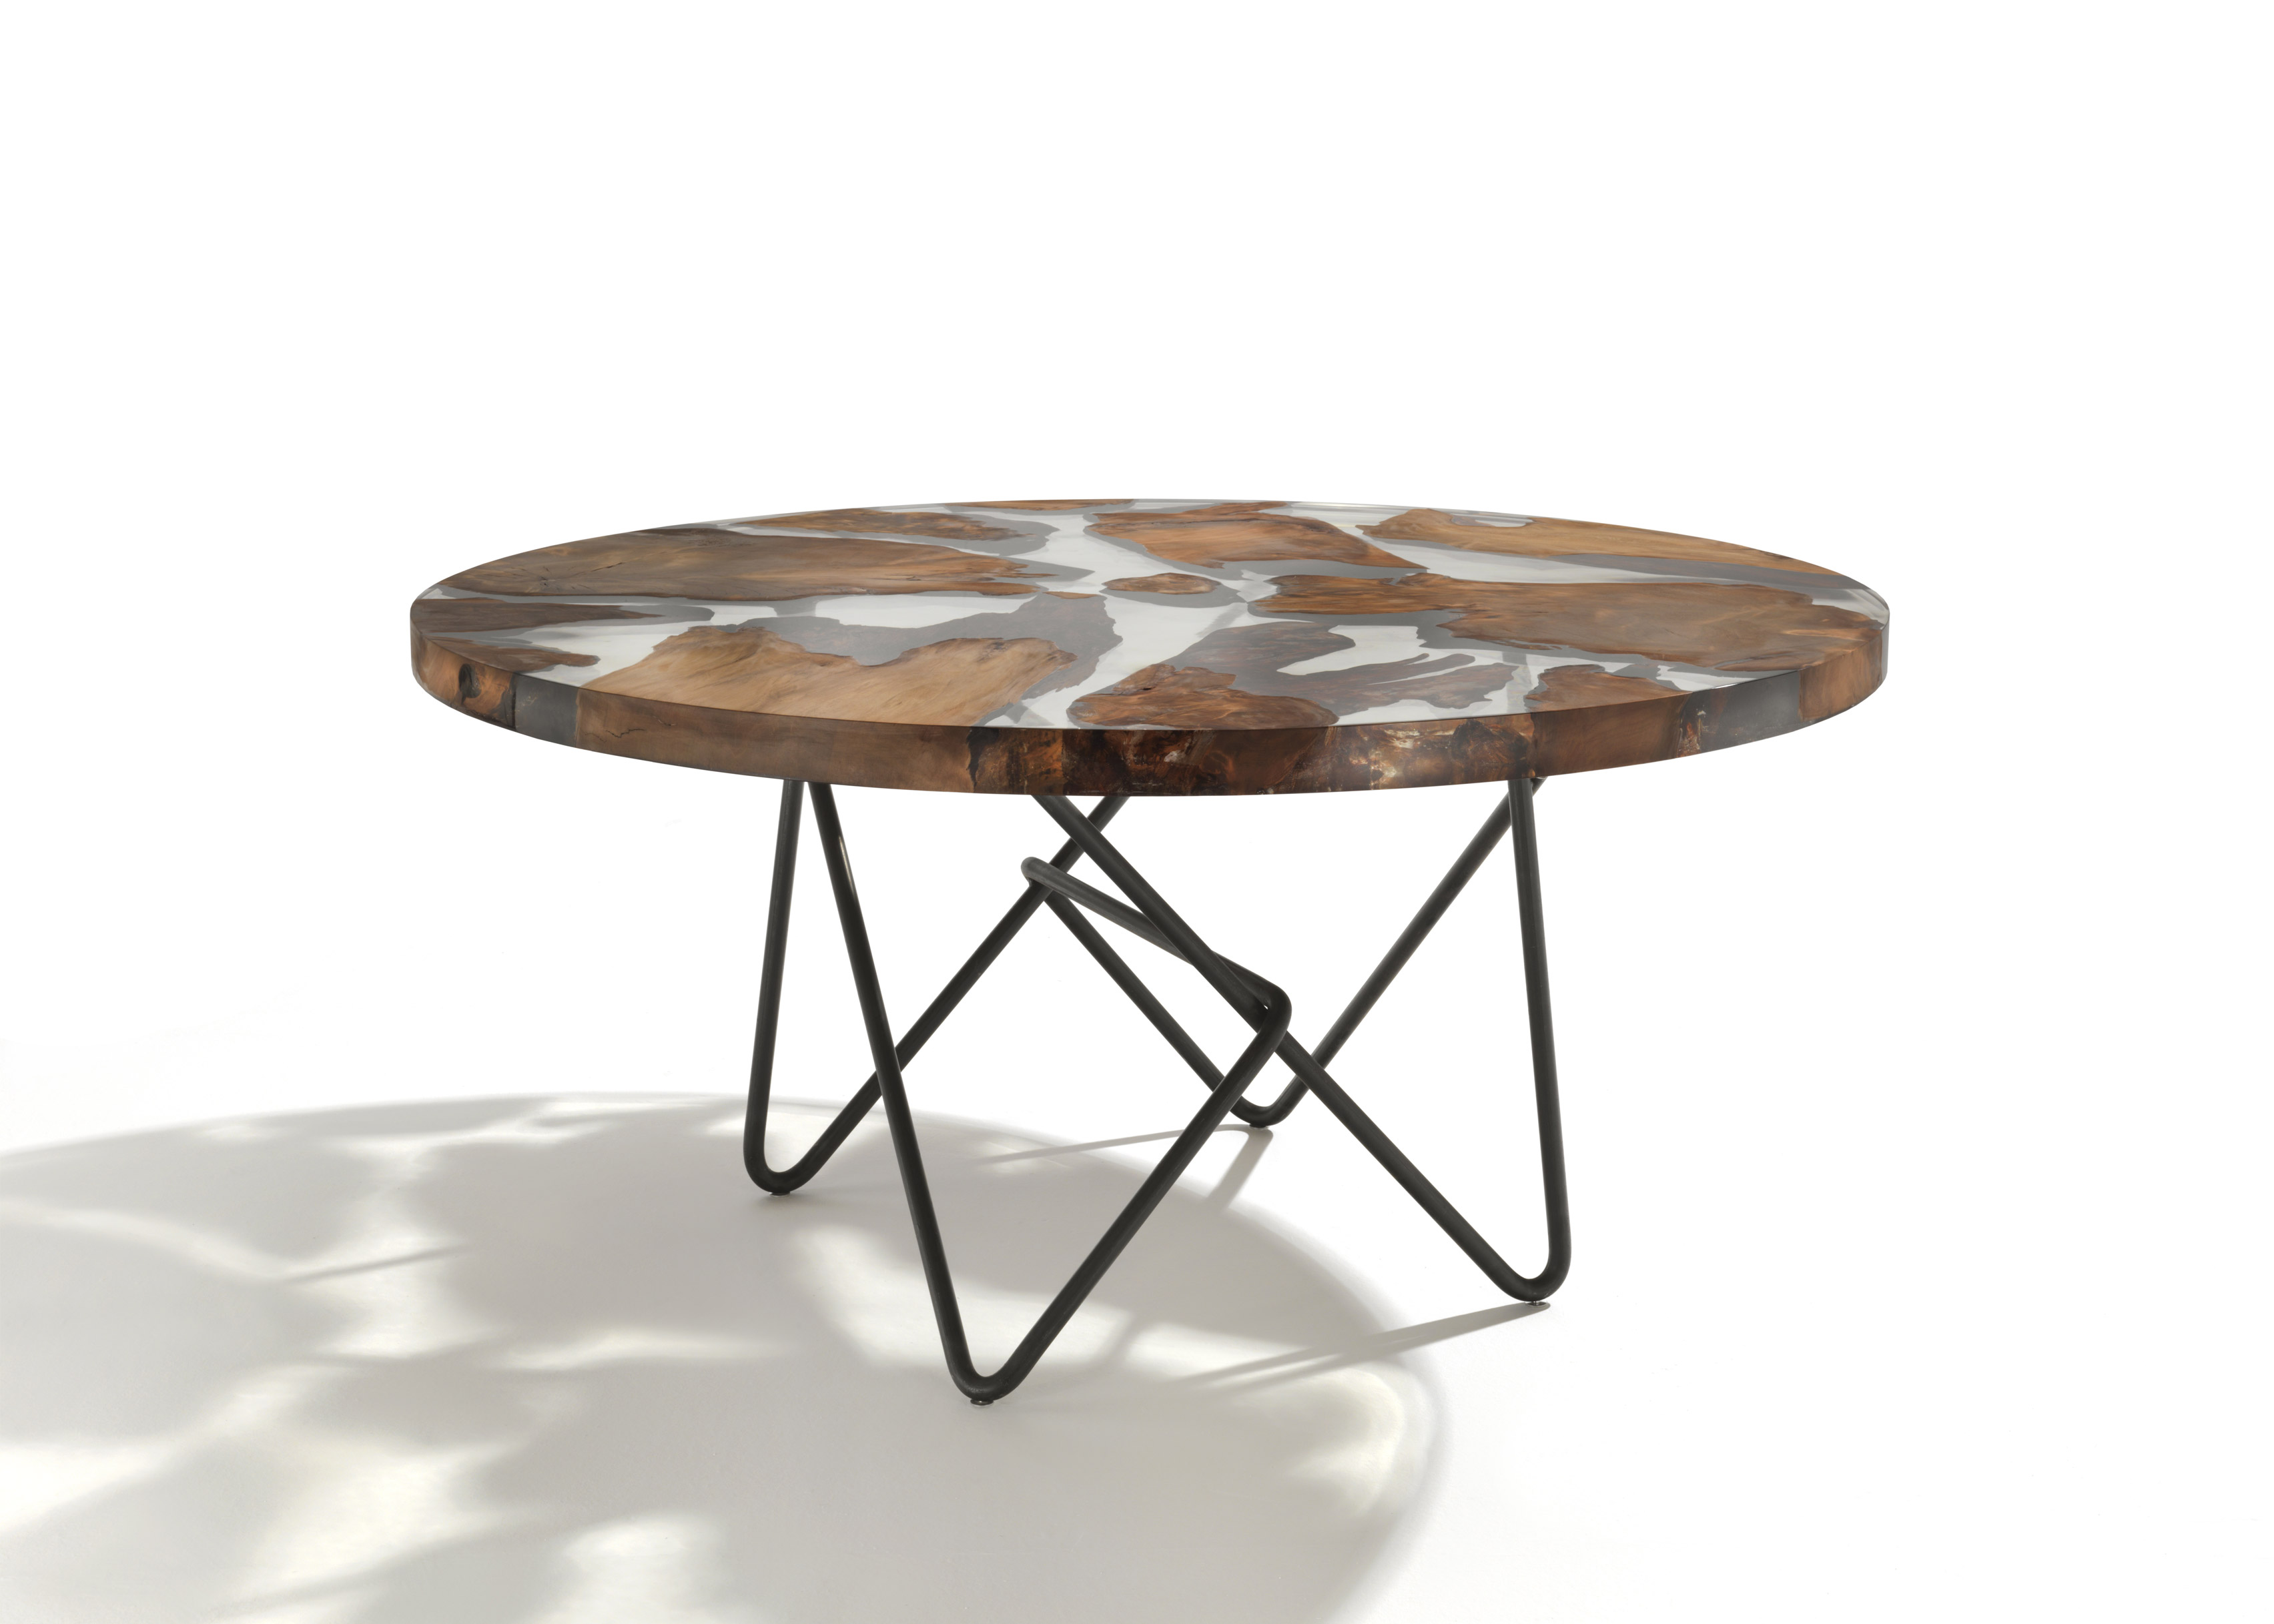 Riva 1920 designs symbolic Earth-shaped table for World Trade Center